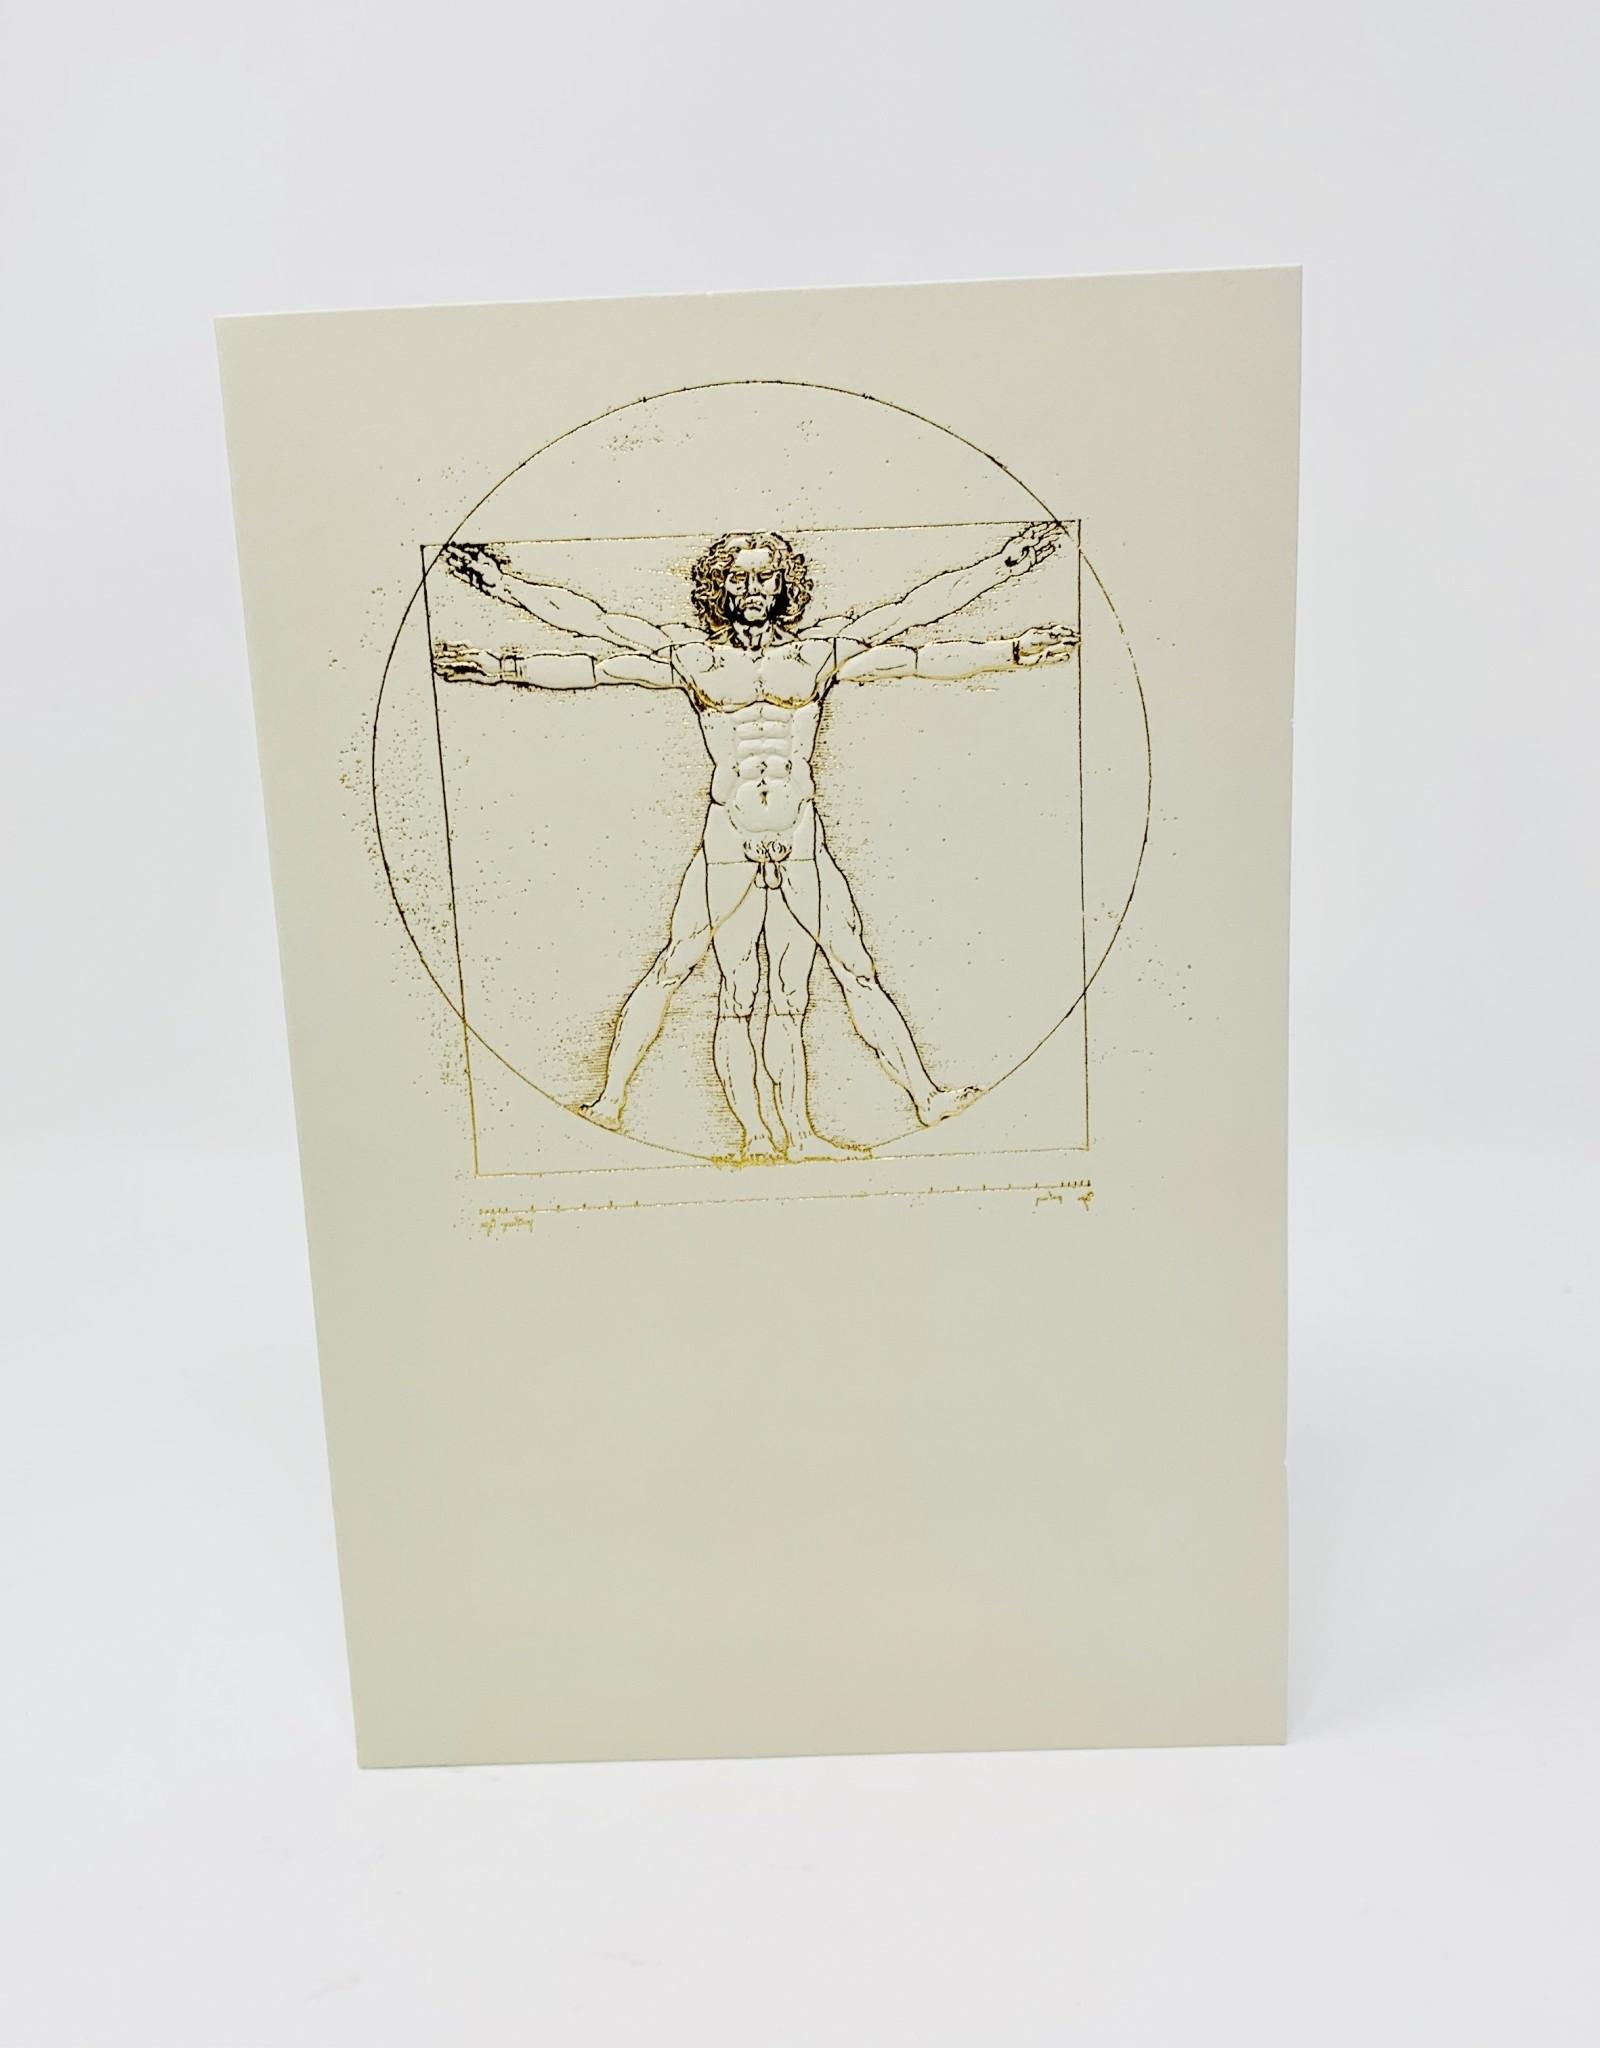 Nelson Line symmetry of man